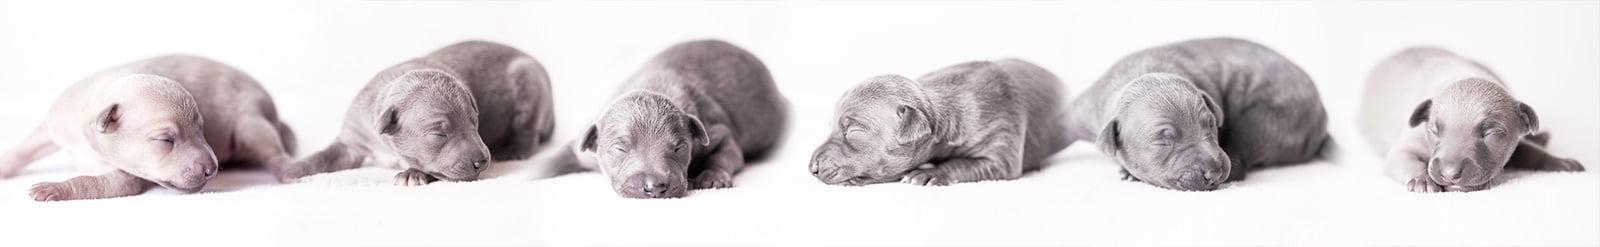 puppies italian greyhound